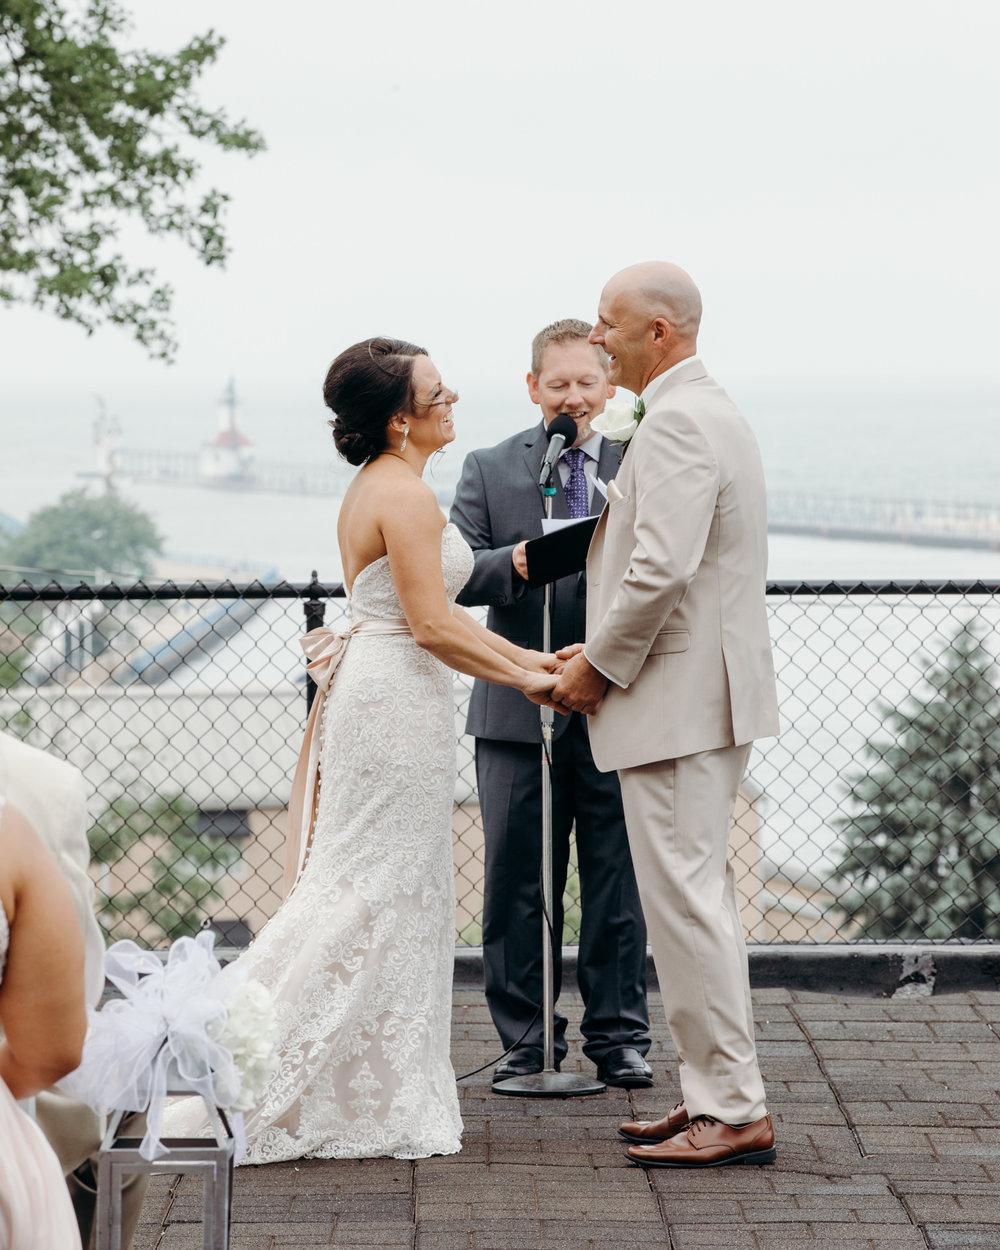 Grant Beachy Tammy Chris wedding photography goshen Saint Joseph veranda whitcomb-040.jpg